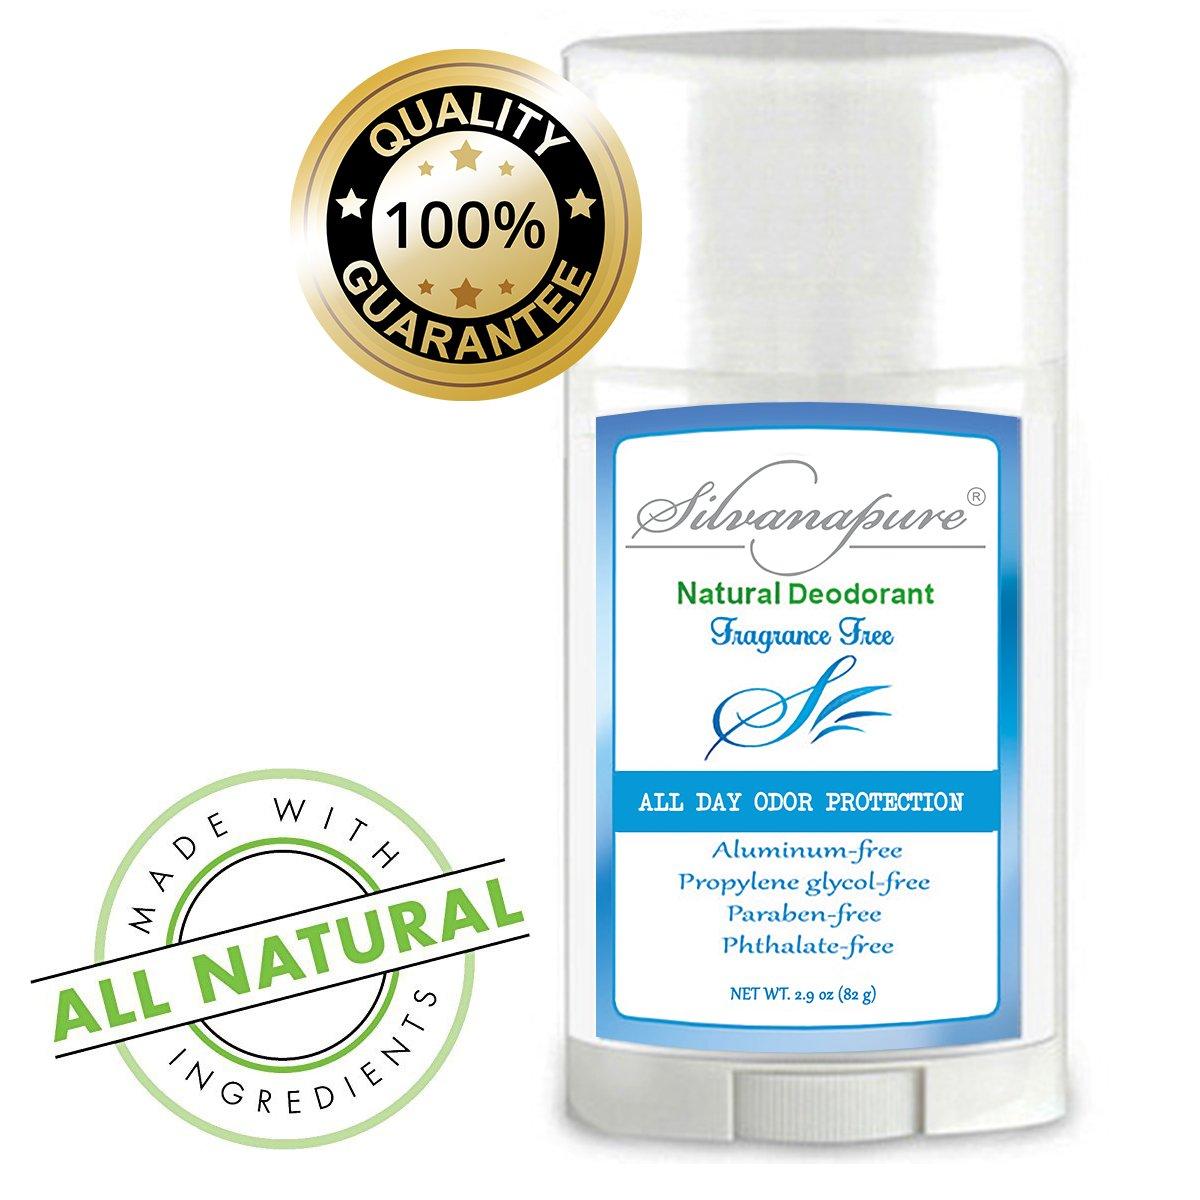 Natural Deodorant Stick Aluminum Free Unscented 2.9 oz | Healthy Deodorant GMO-Free | 100% Non-Toxic Deodorant | All Day Protection | Natural Deodorant For Men And Women | Non Irritating | No Rash